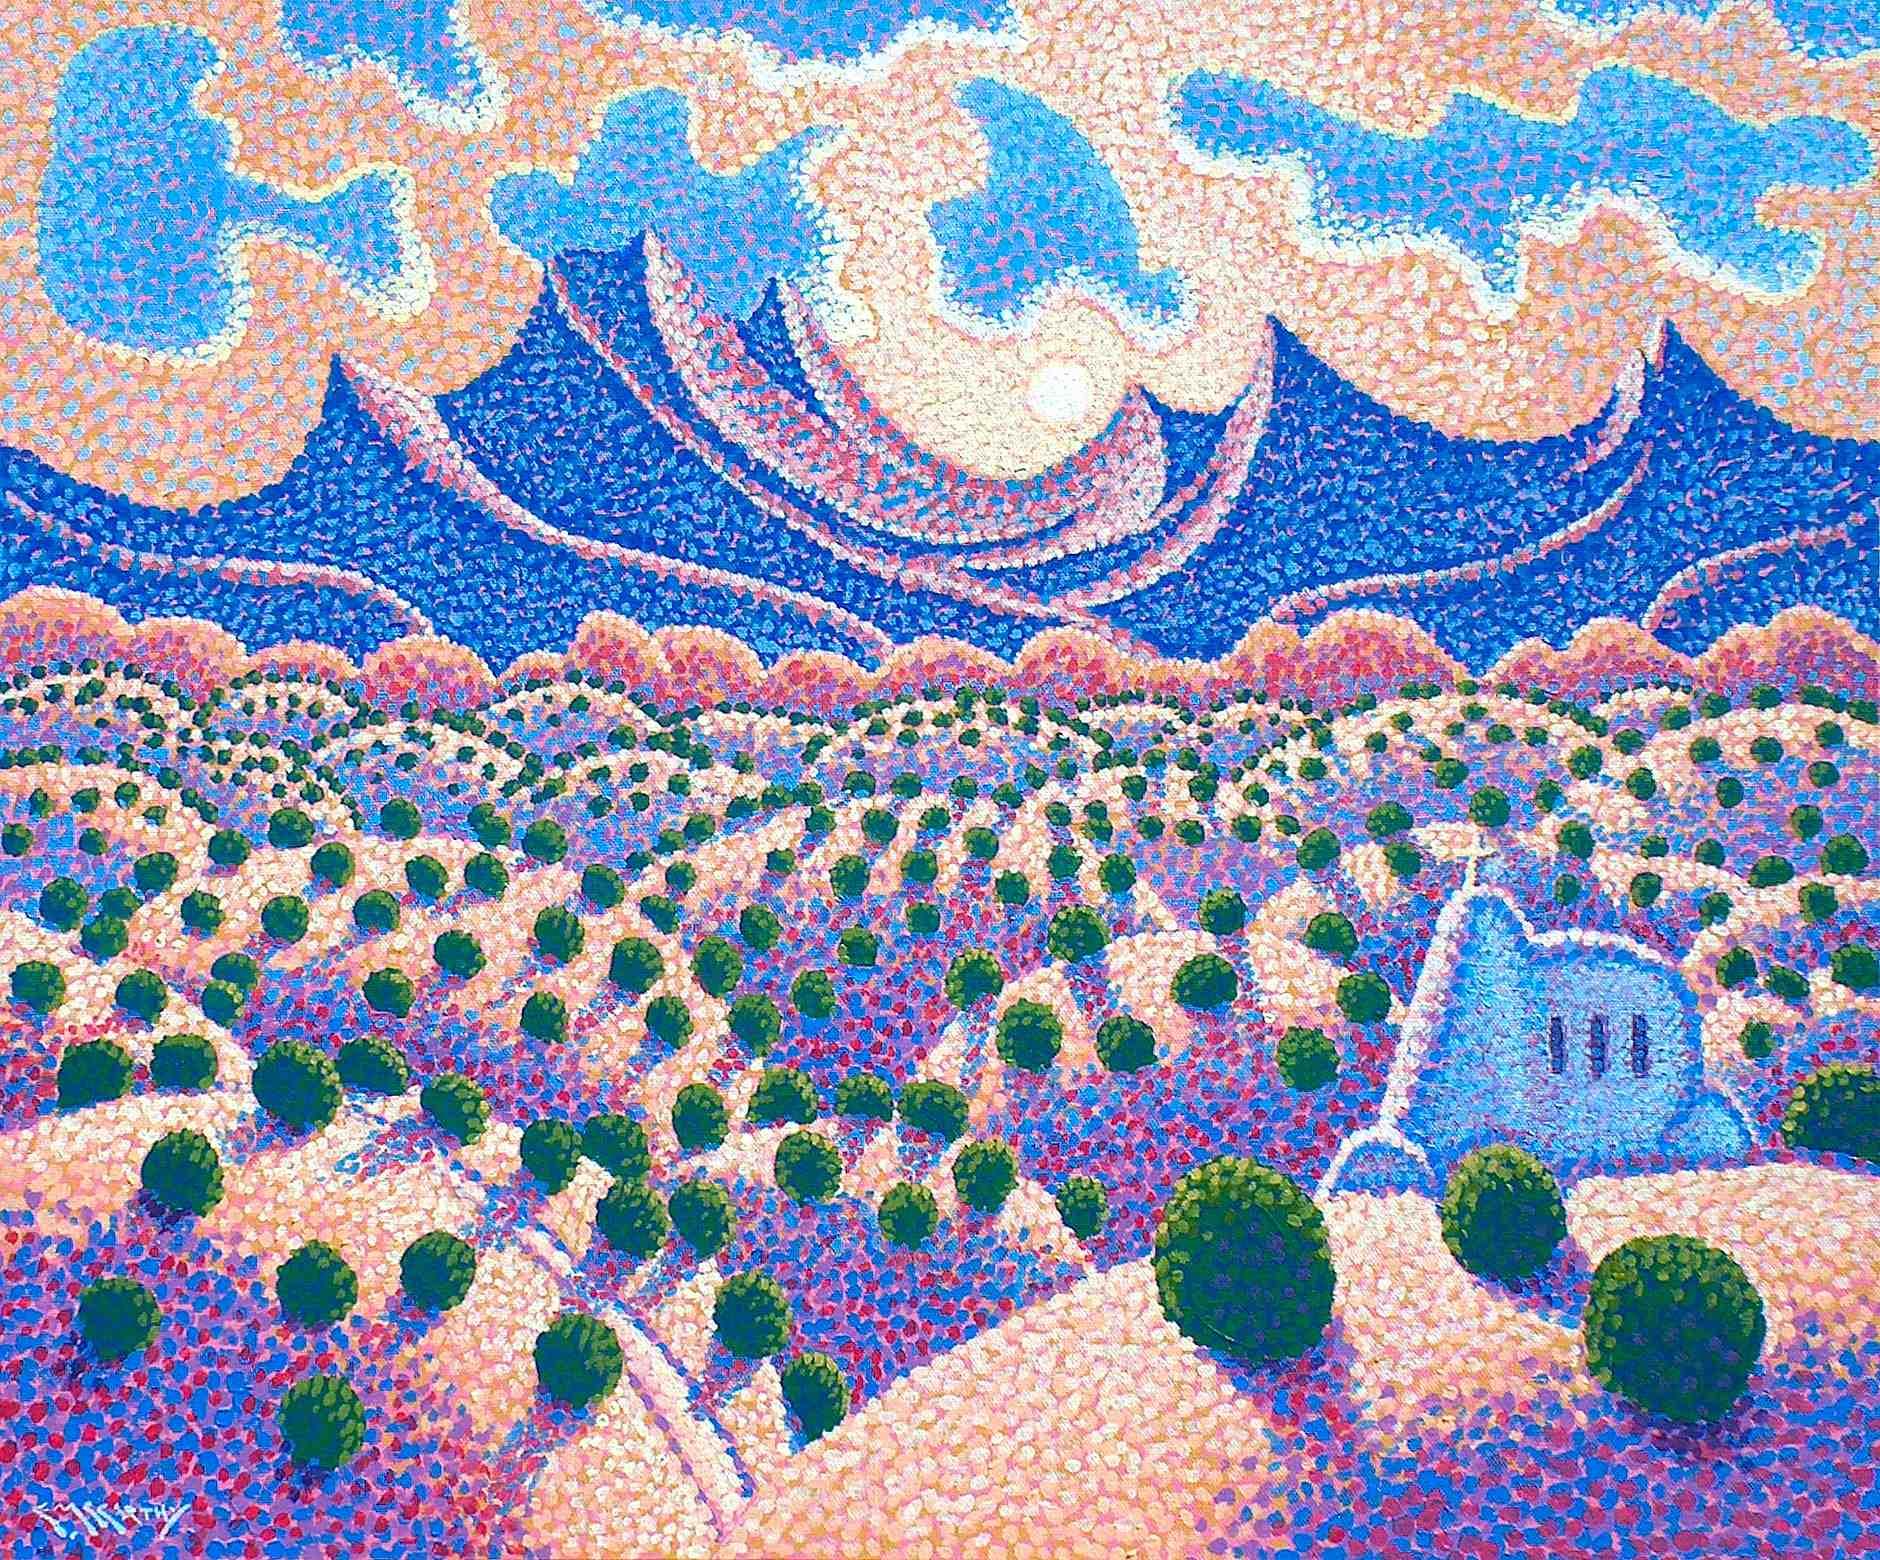 Sundown Over The Land Of Enchantment